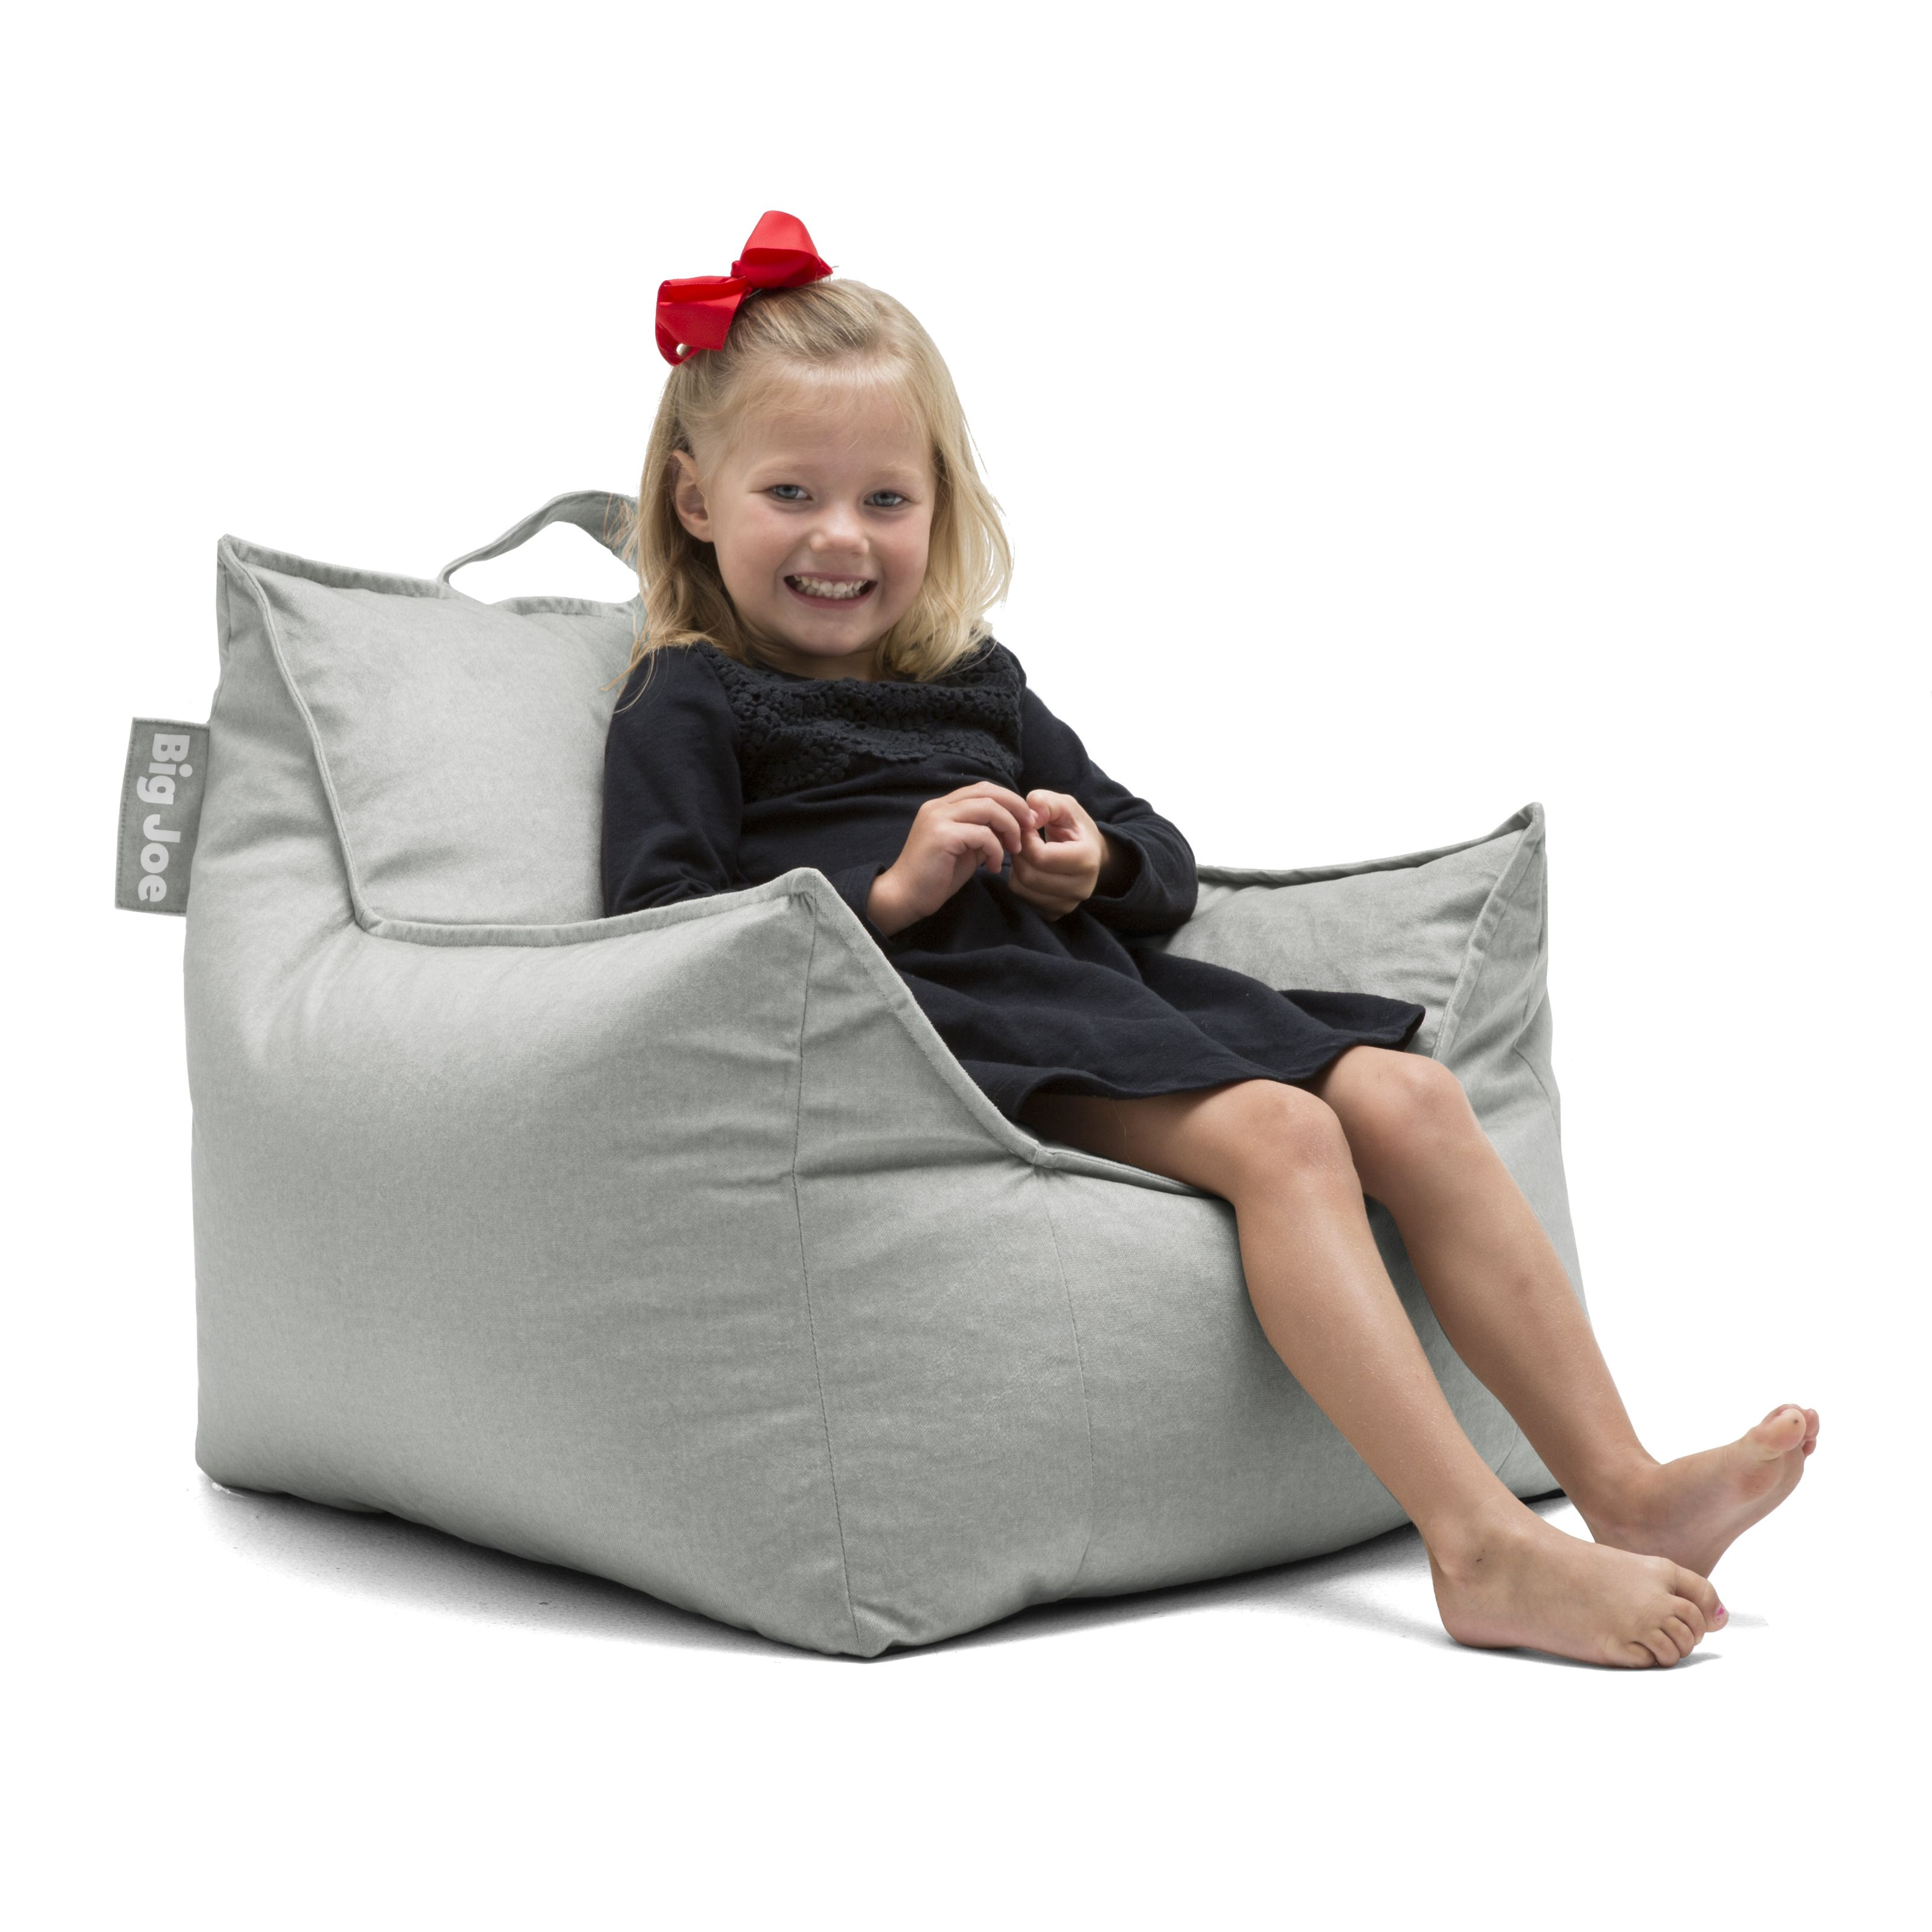 Big Joe Kid's Mitten Bean Bag Chair, Multiple Colors